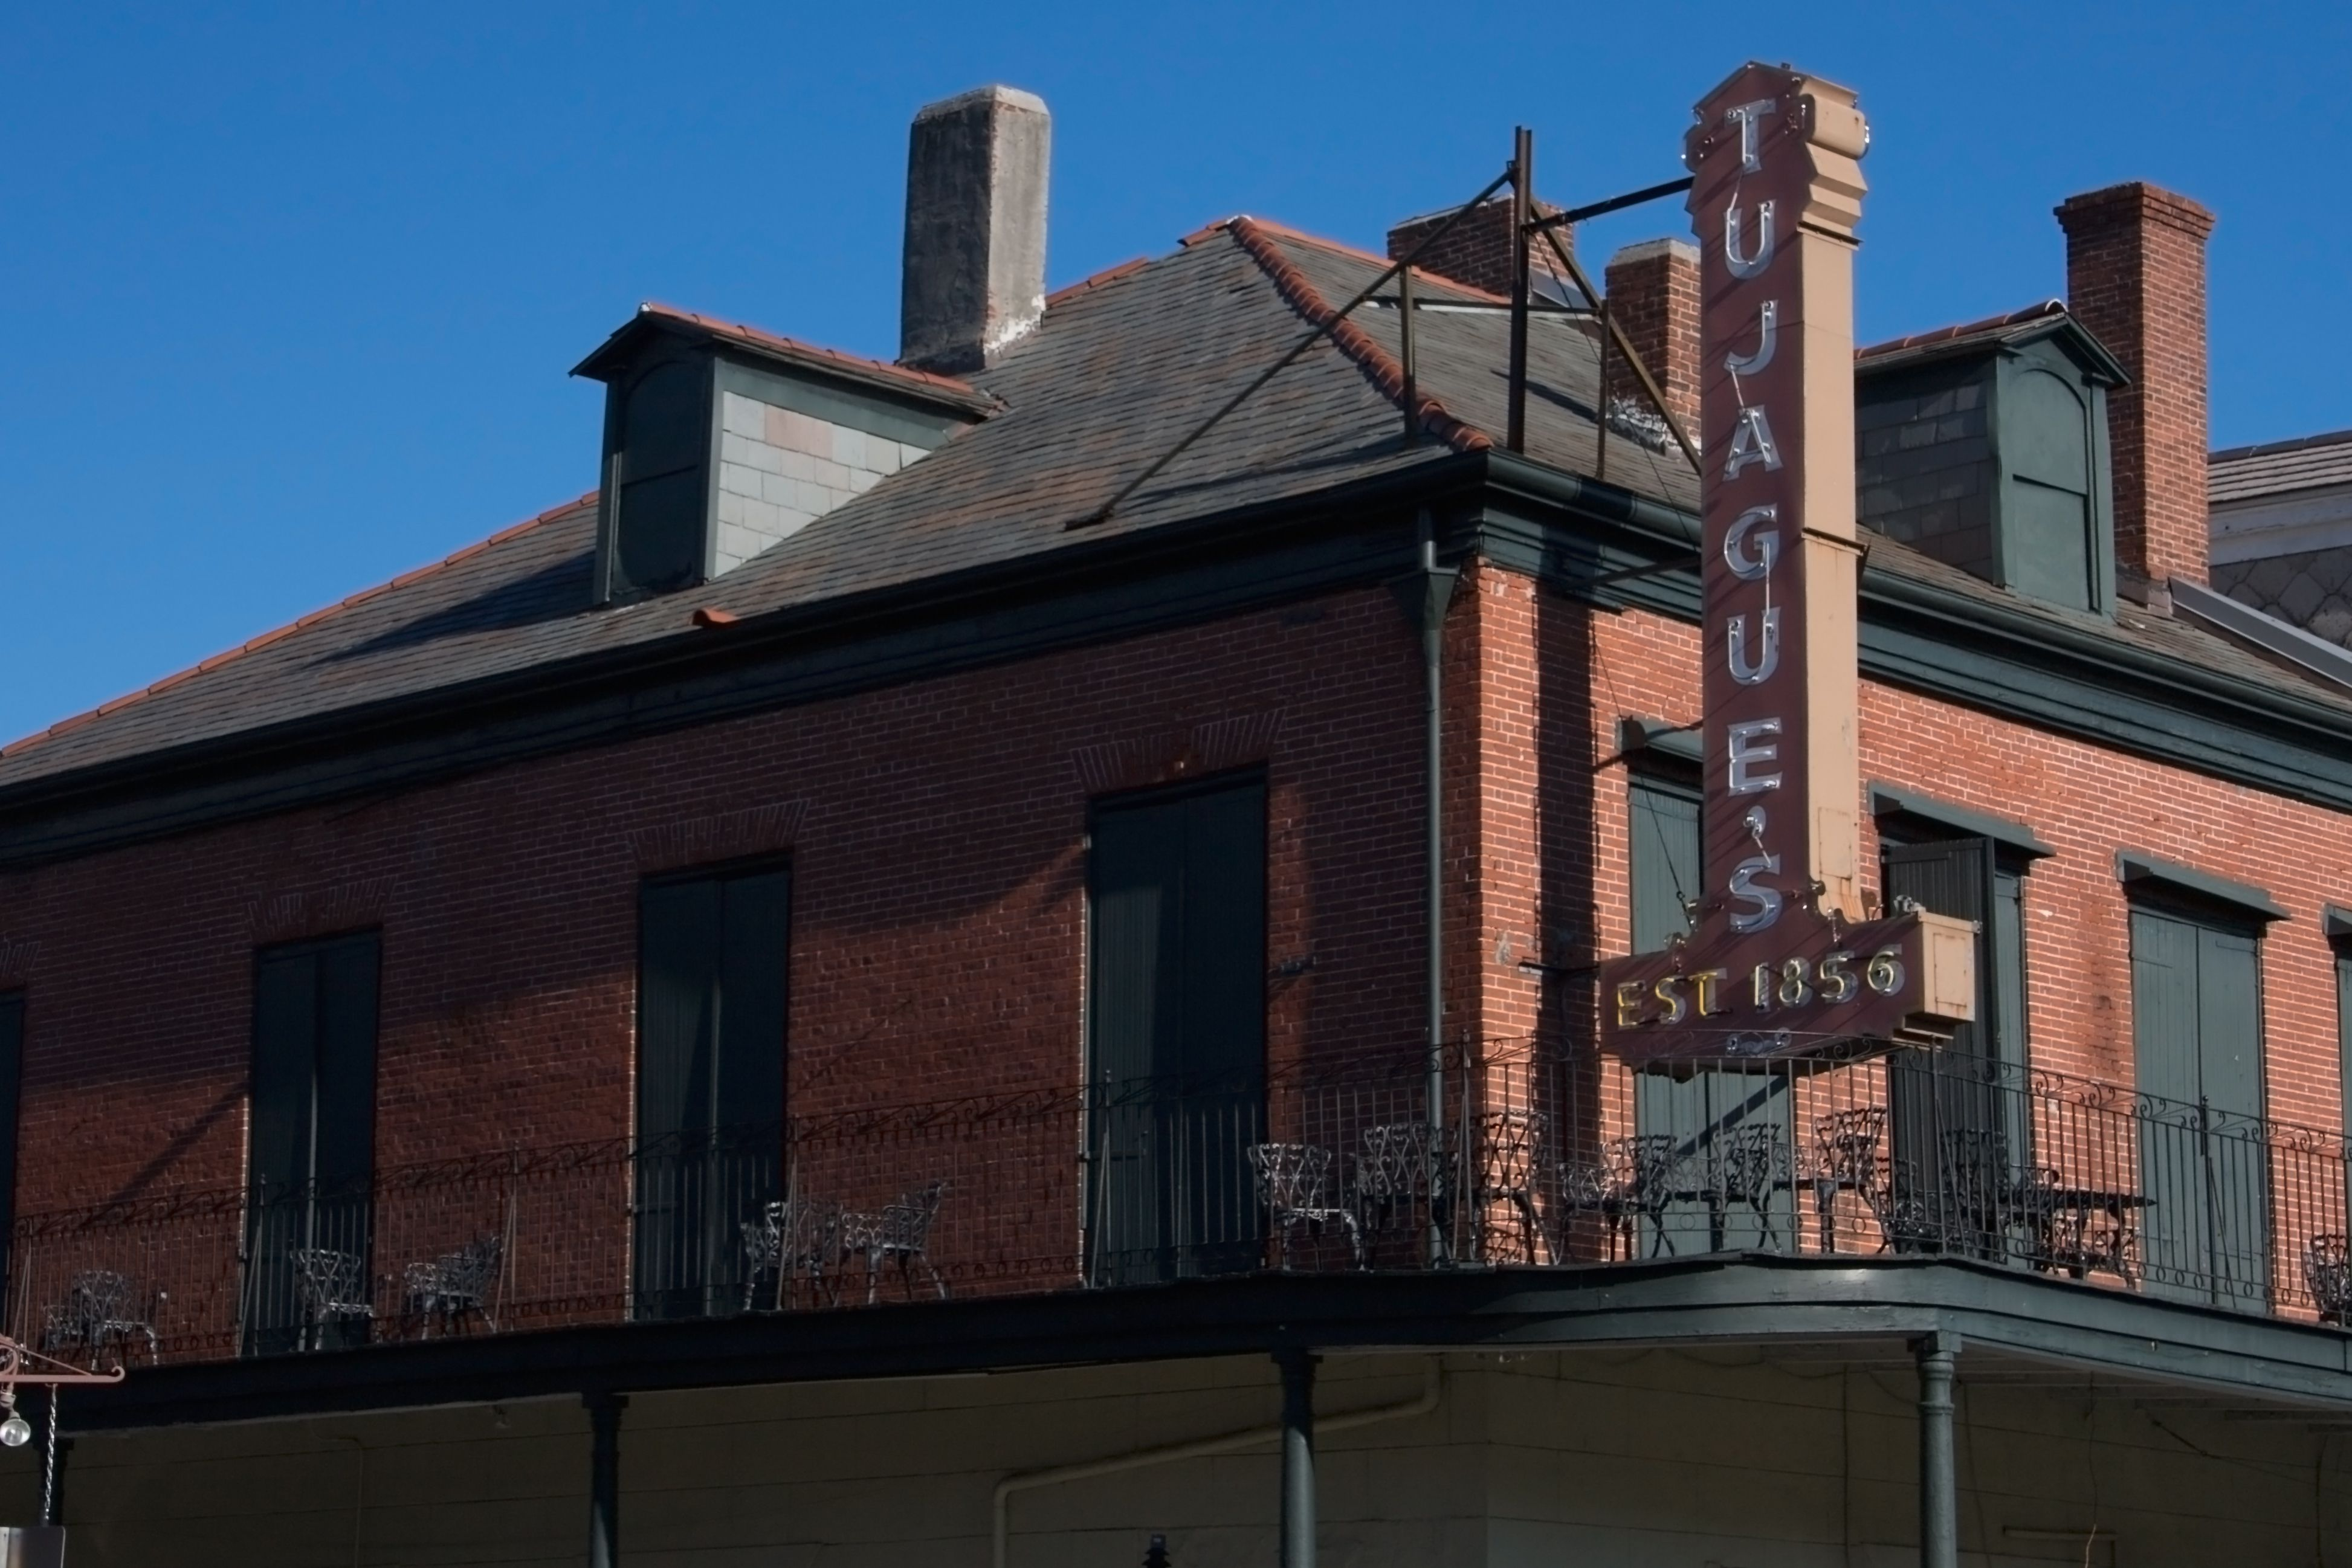 Tujague's Restaurant, Decatur St., New Orleans, Louisiana